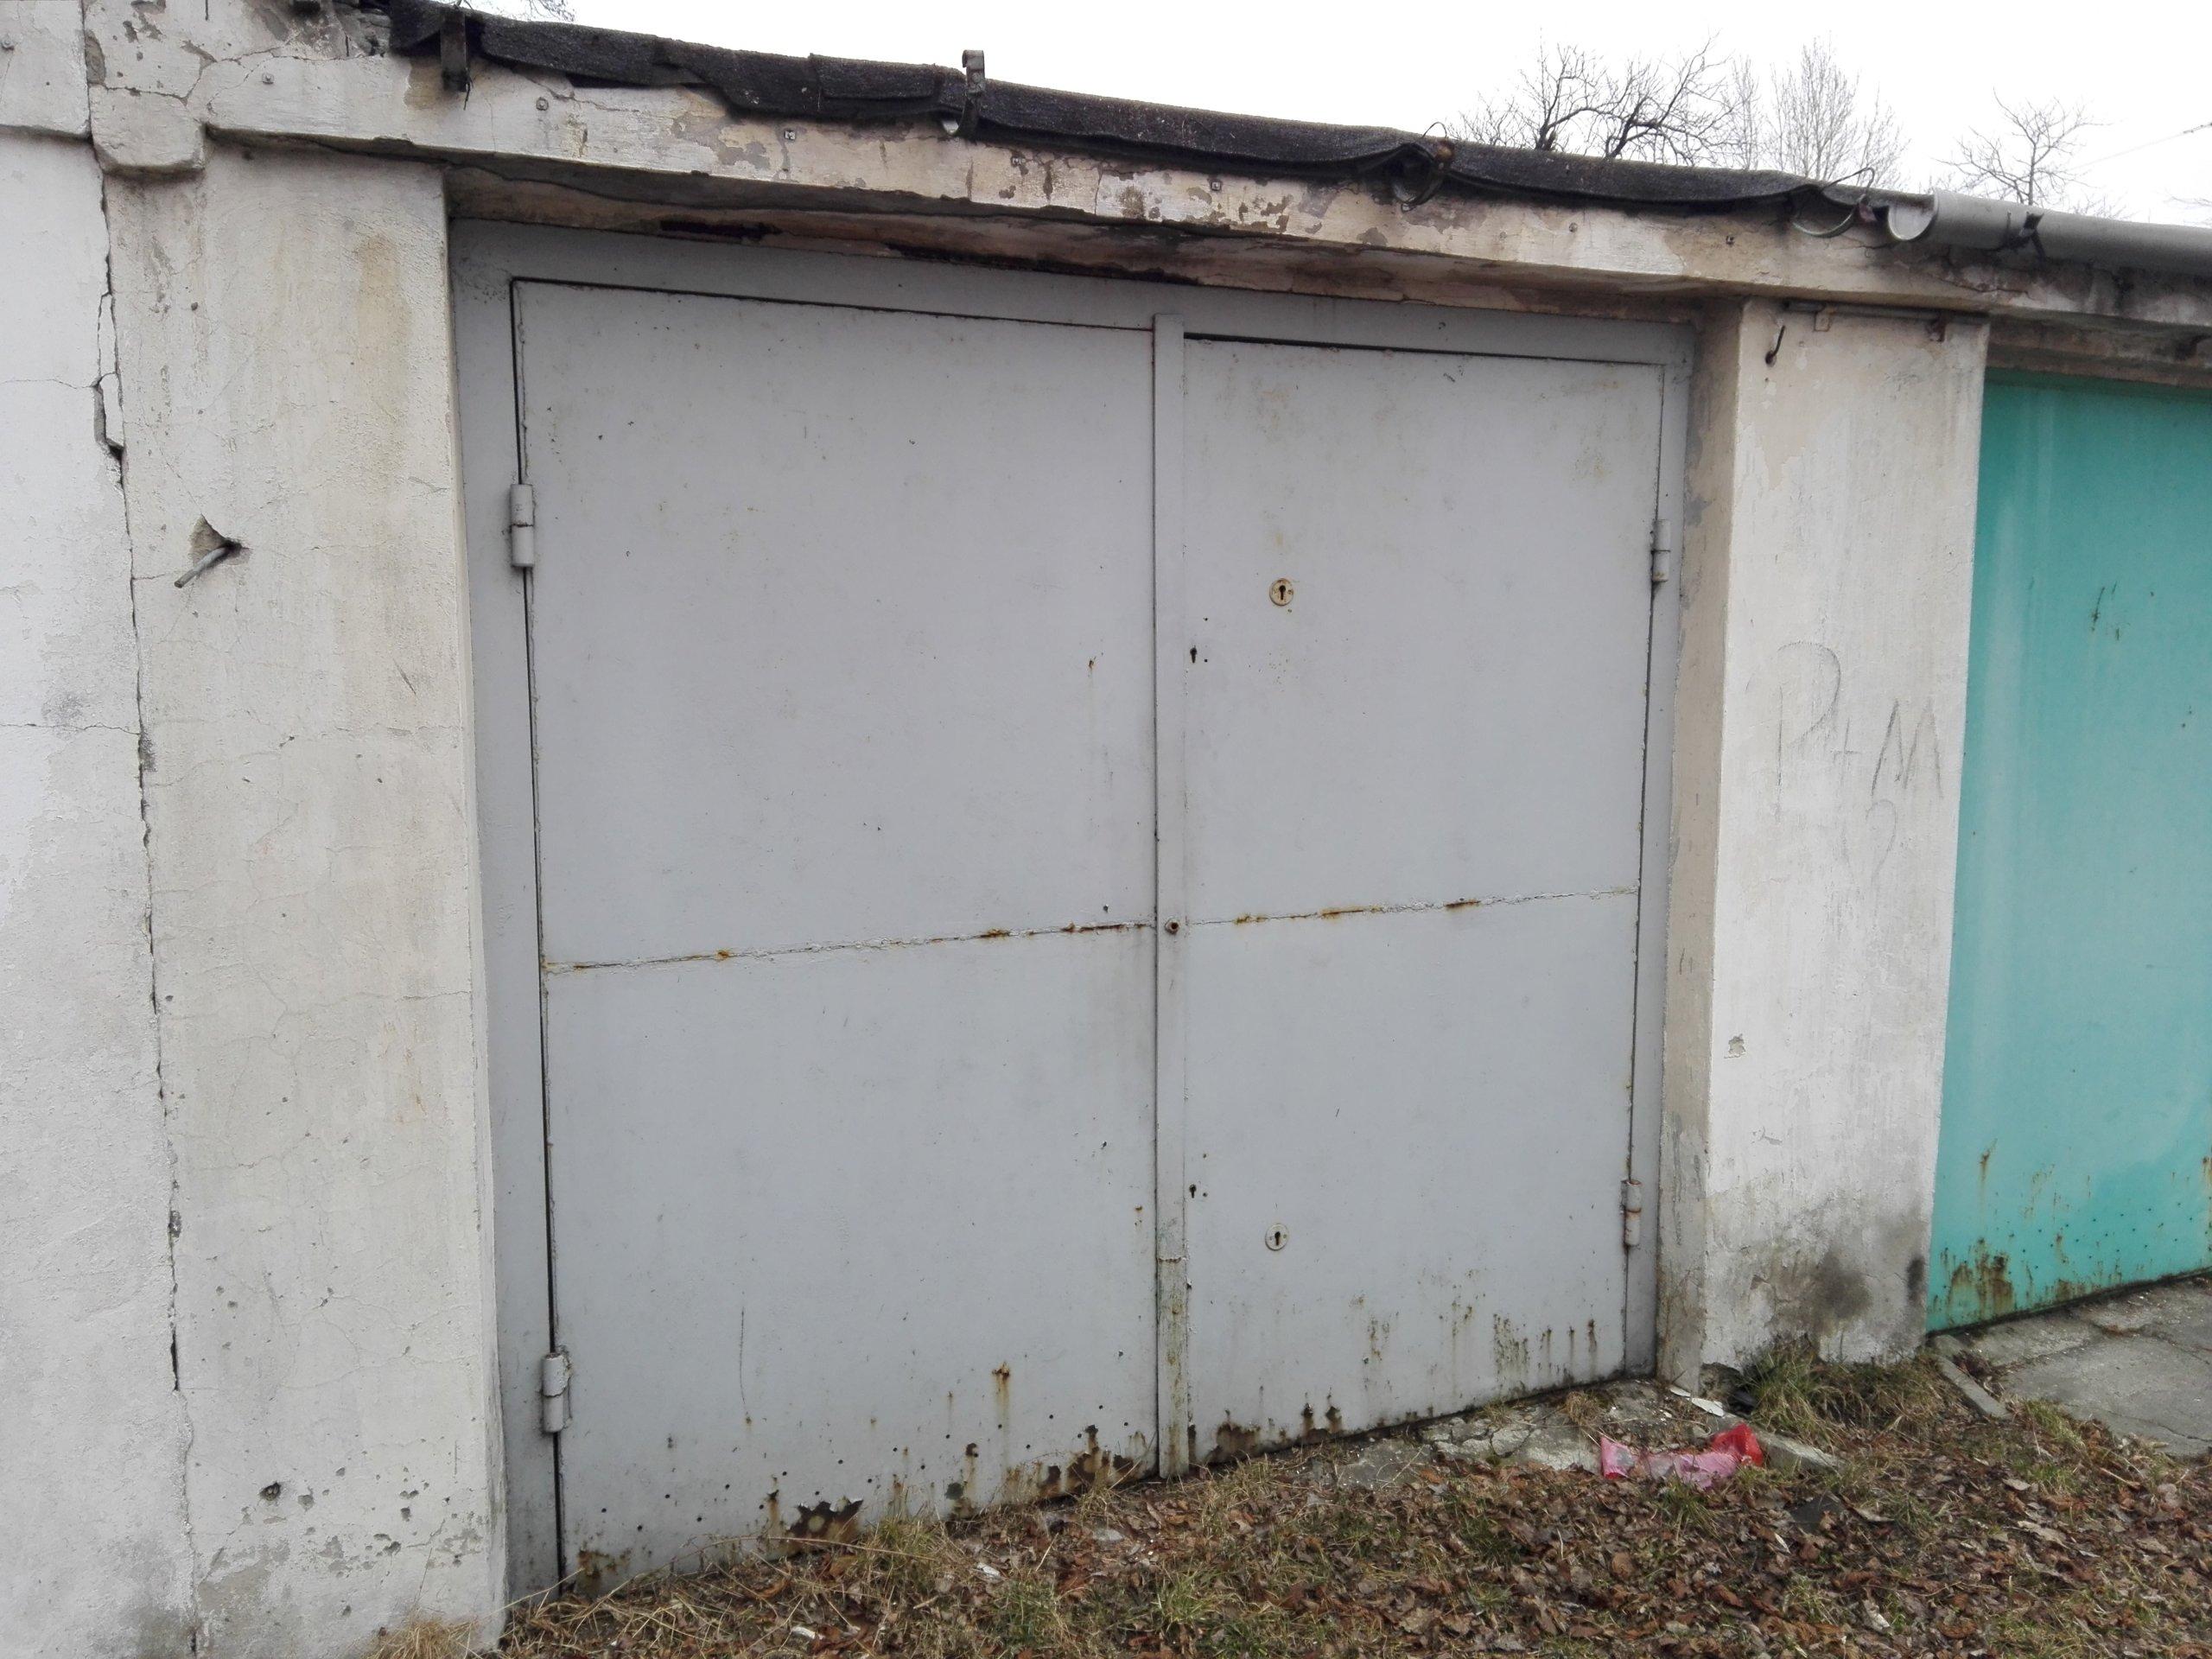 Solidny Murowany Garaż Katowice Uloswobodzenia 7263419230